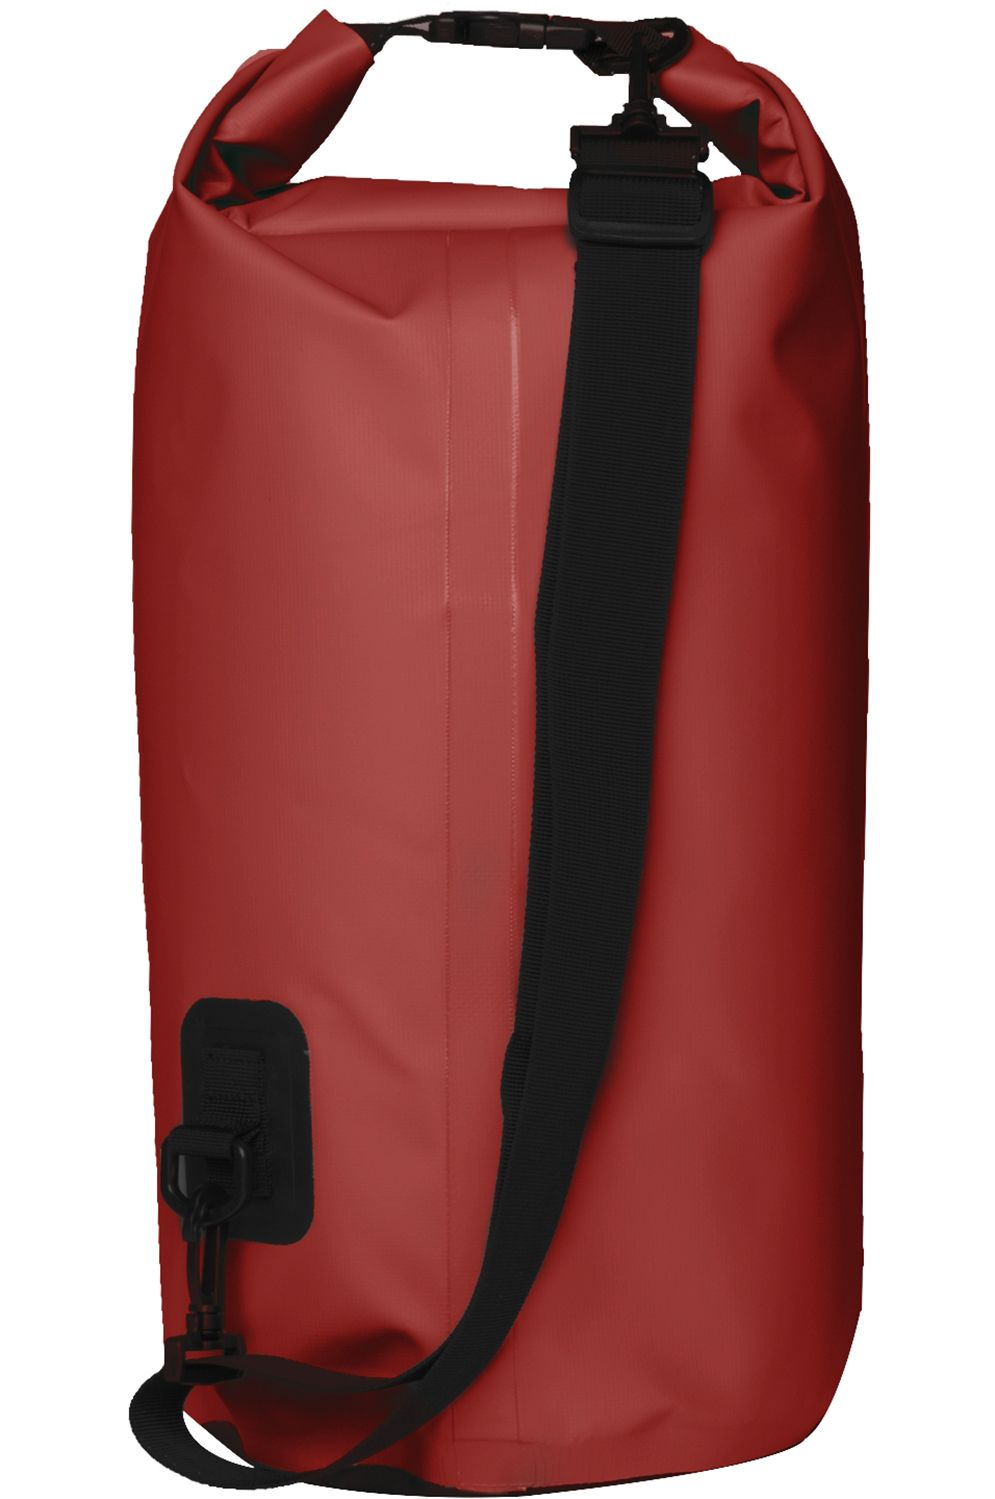 Vissla Bag 7 SEAS 20 LITER DRY Red